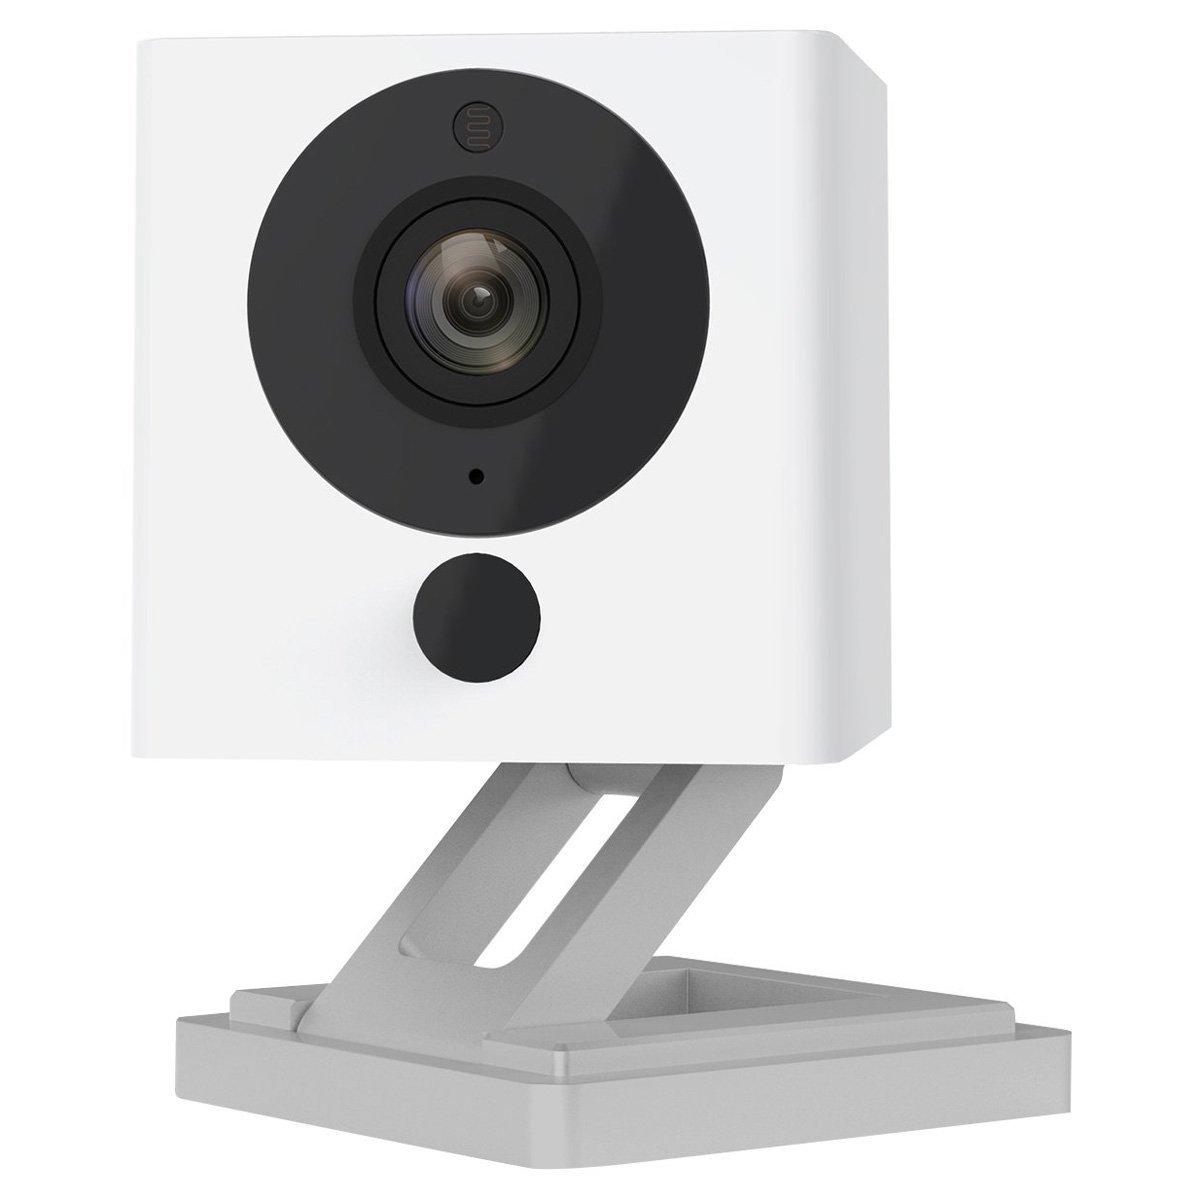 XHZNDZ Camera Wall Mount Bracket, Protective Adjustable Indoor Mount 1080p Smart Camera and Spot Camera